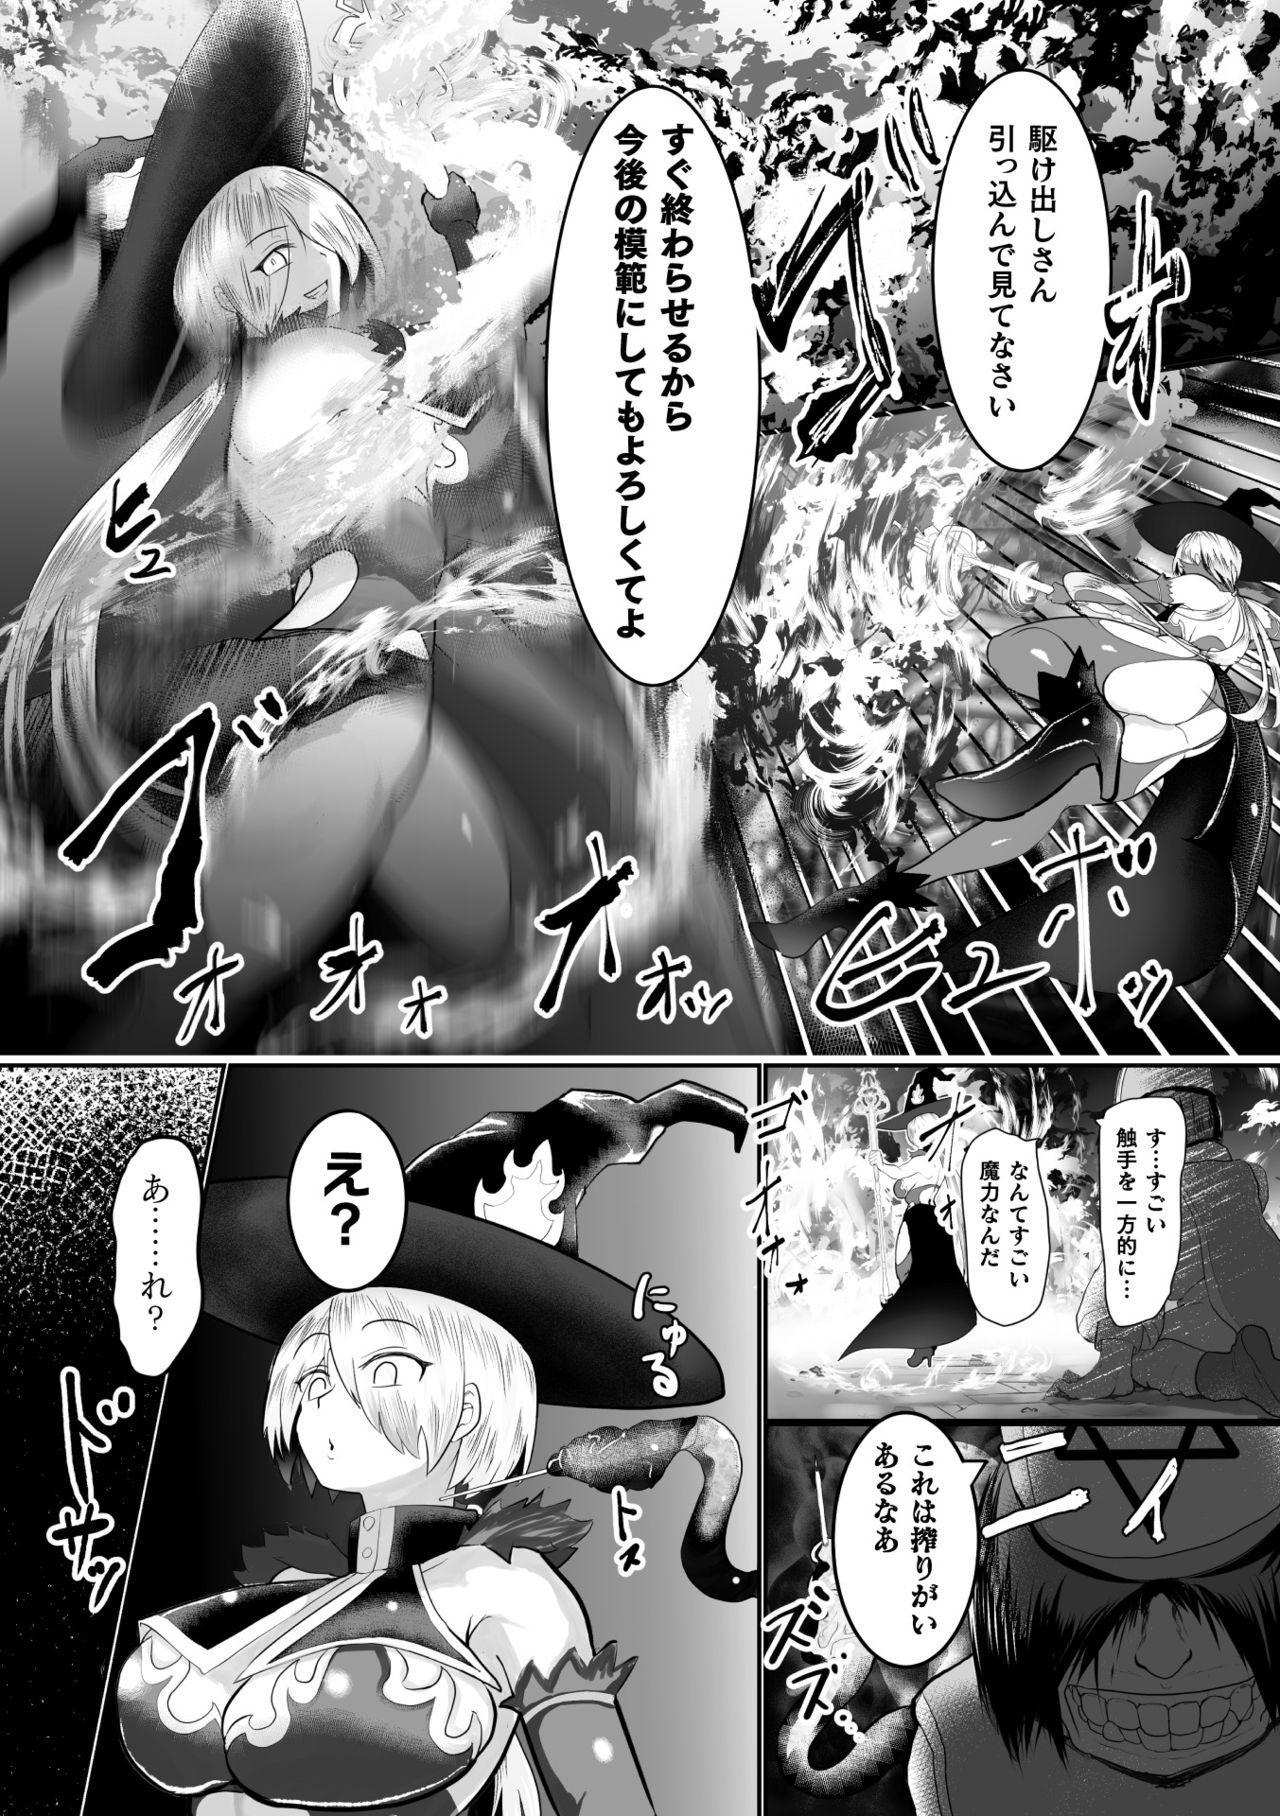 2D Comic Magazine Capsule Kan Seigi no Heroine Mesu Ochi Jikken! Vol. 2 50